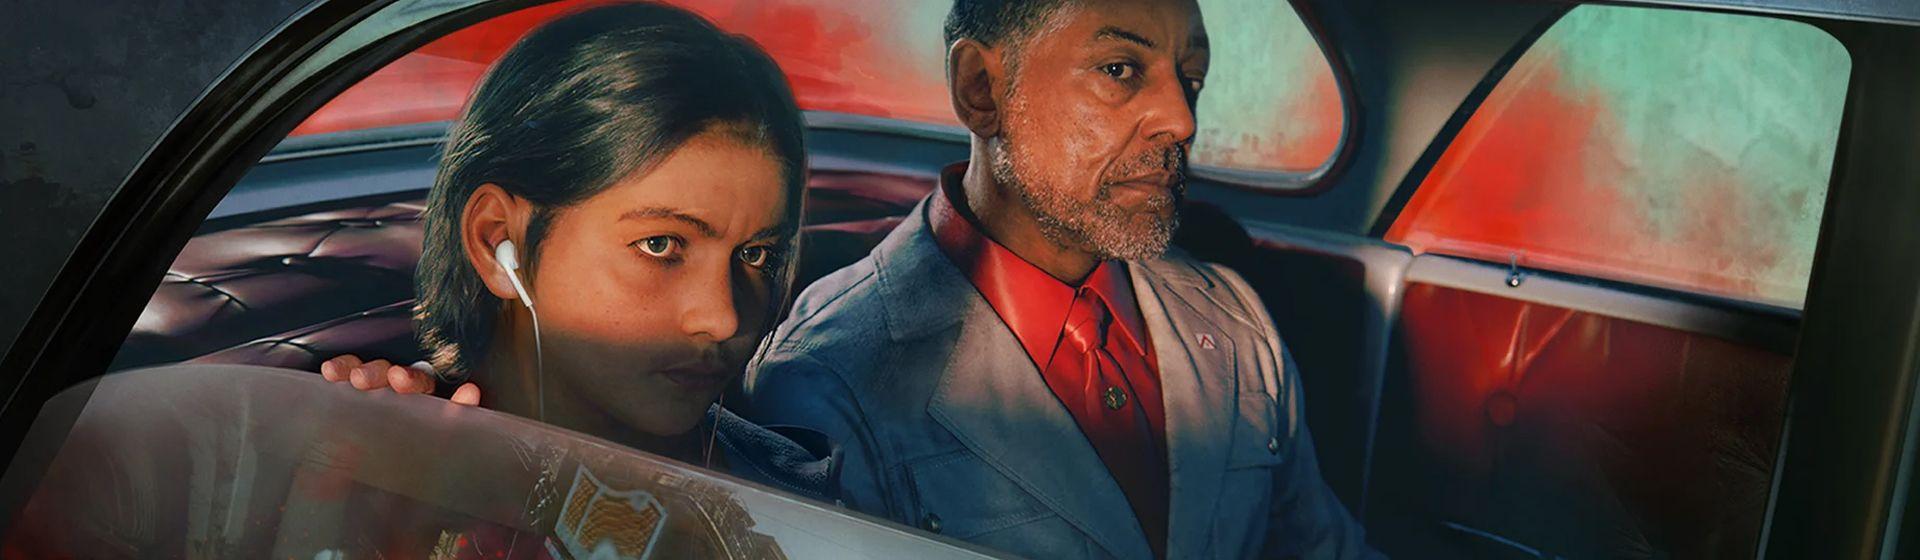 Ubisoft Forward: tudo sobre Far Cry 6, Watch Dogs e Assassin's Creed